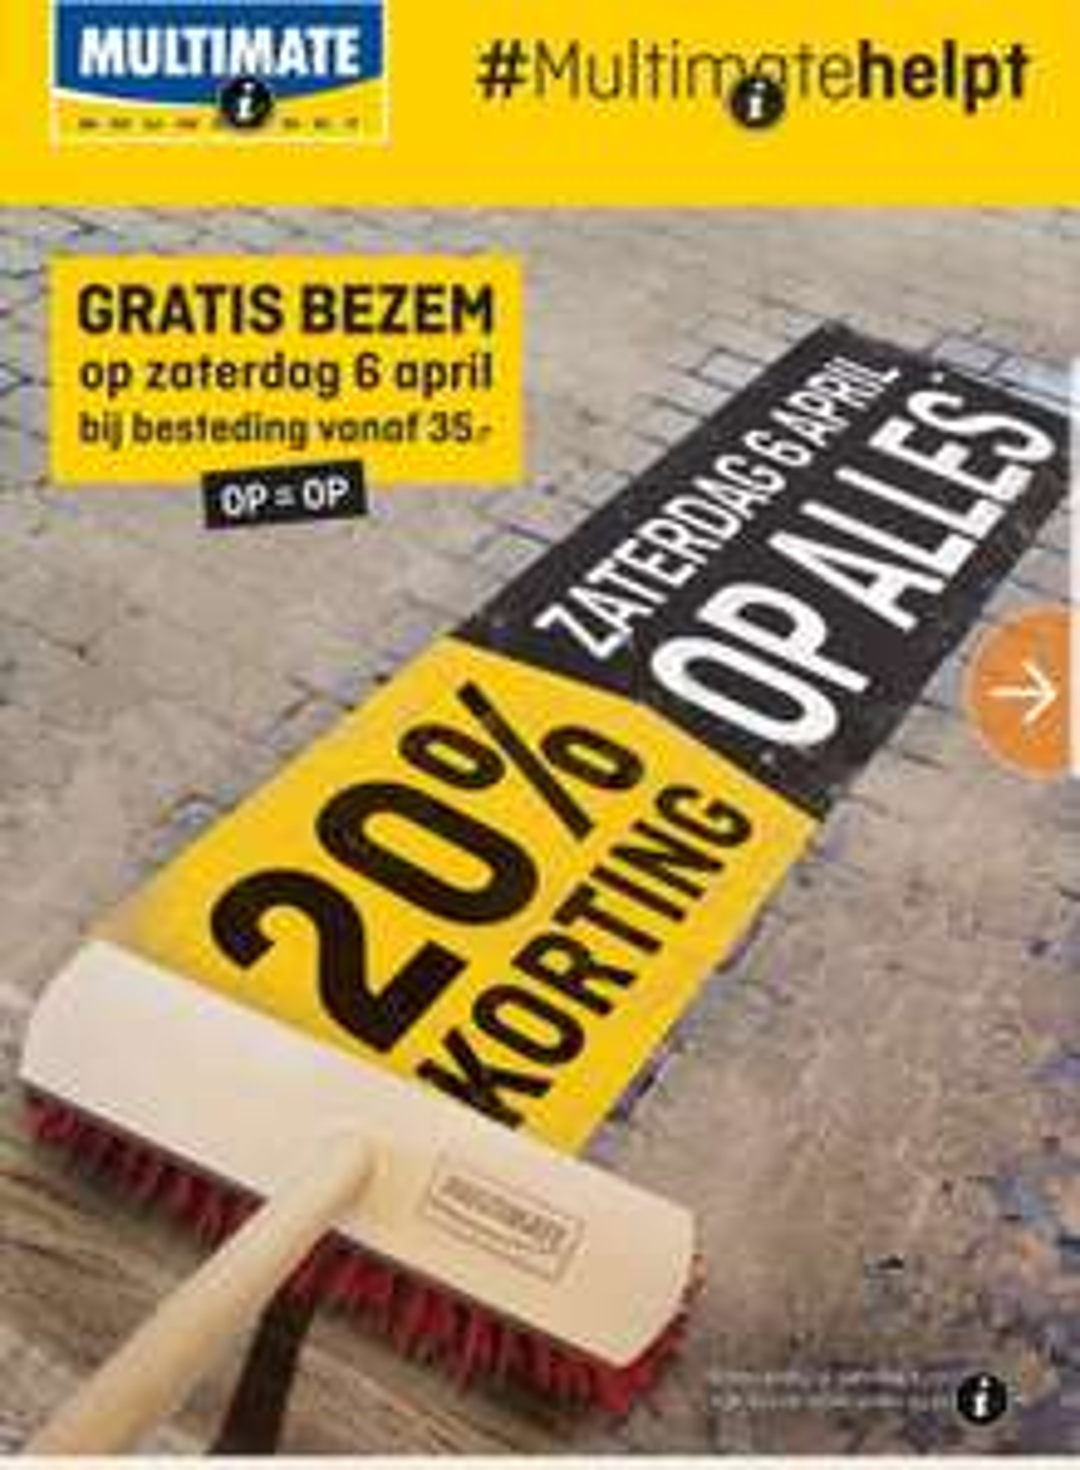 20% korting @ Multimate & Hubo vandaag (+gratis bezem bij 35euro besteding)